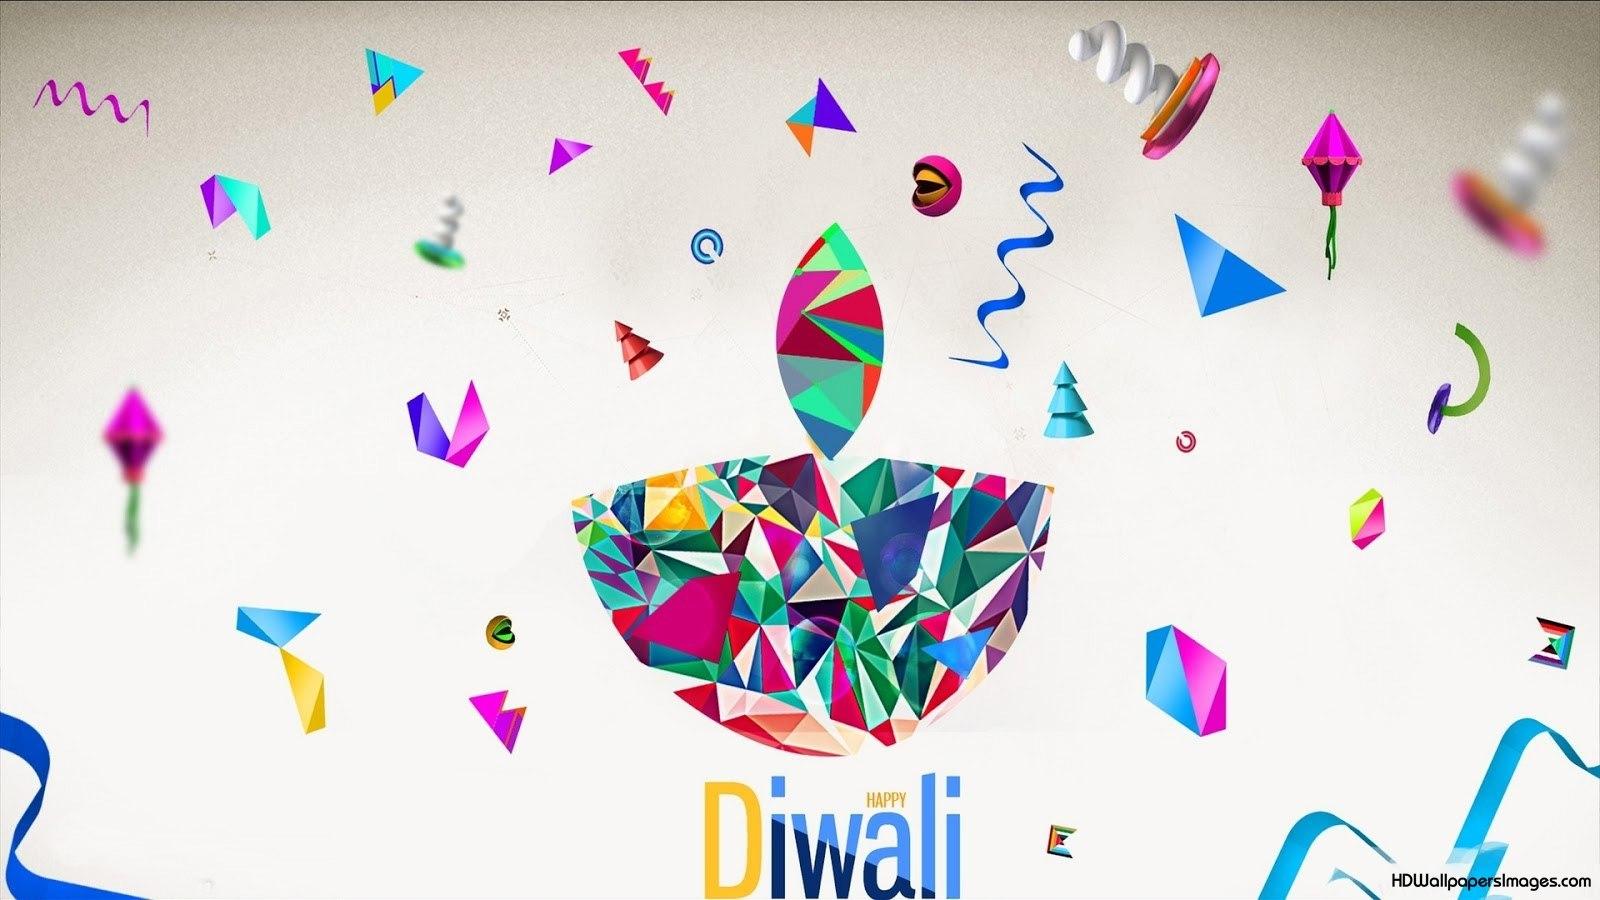 Happy Diwali Wallpaper 2017 Diwalli Whatsapp Status Videos